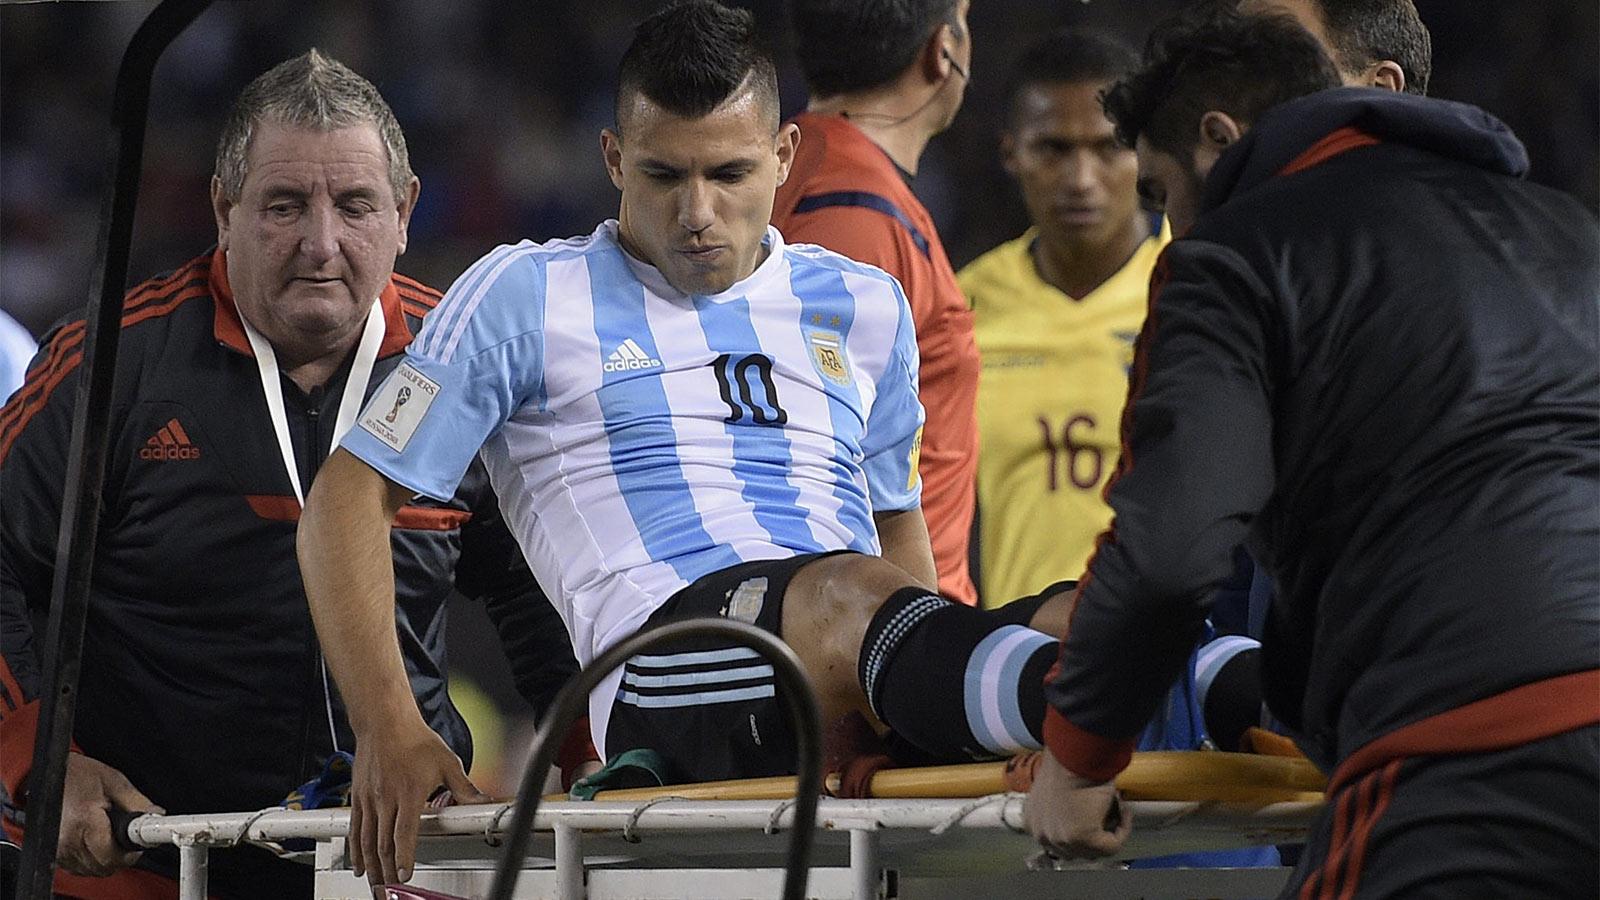 Man City forward Aguero 'not far away' from injury return